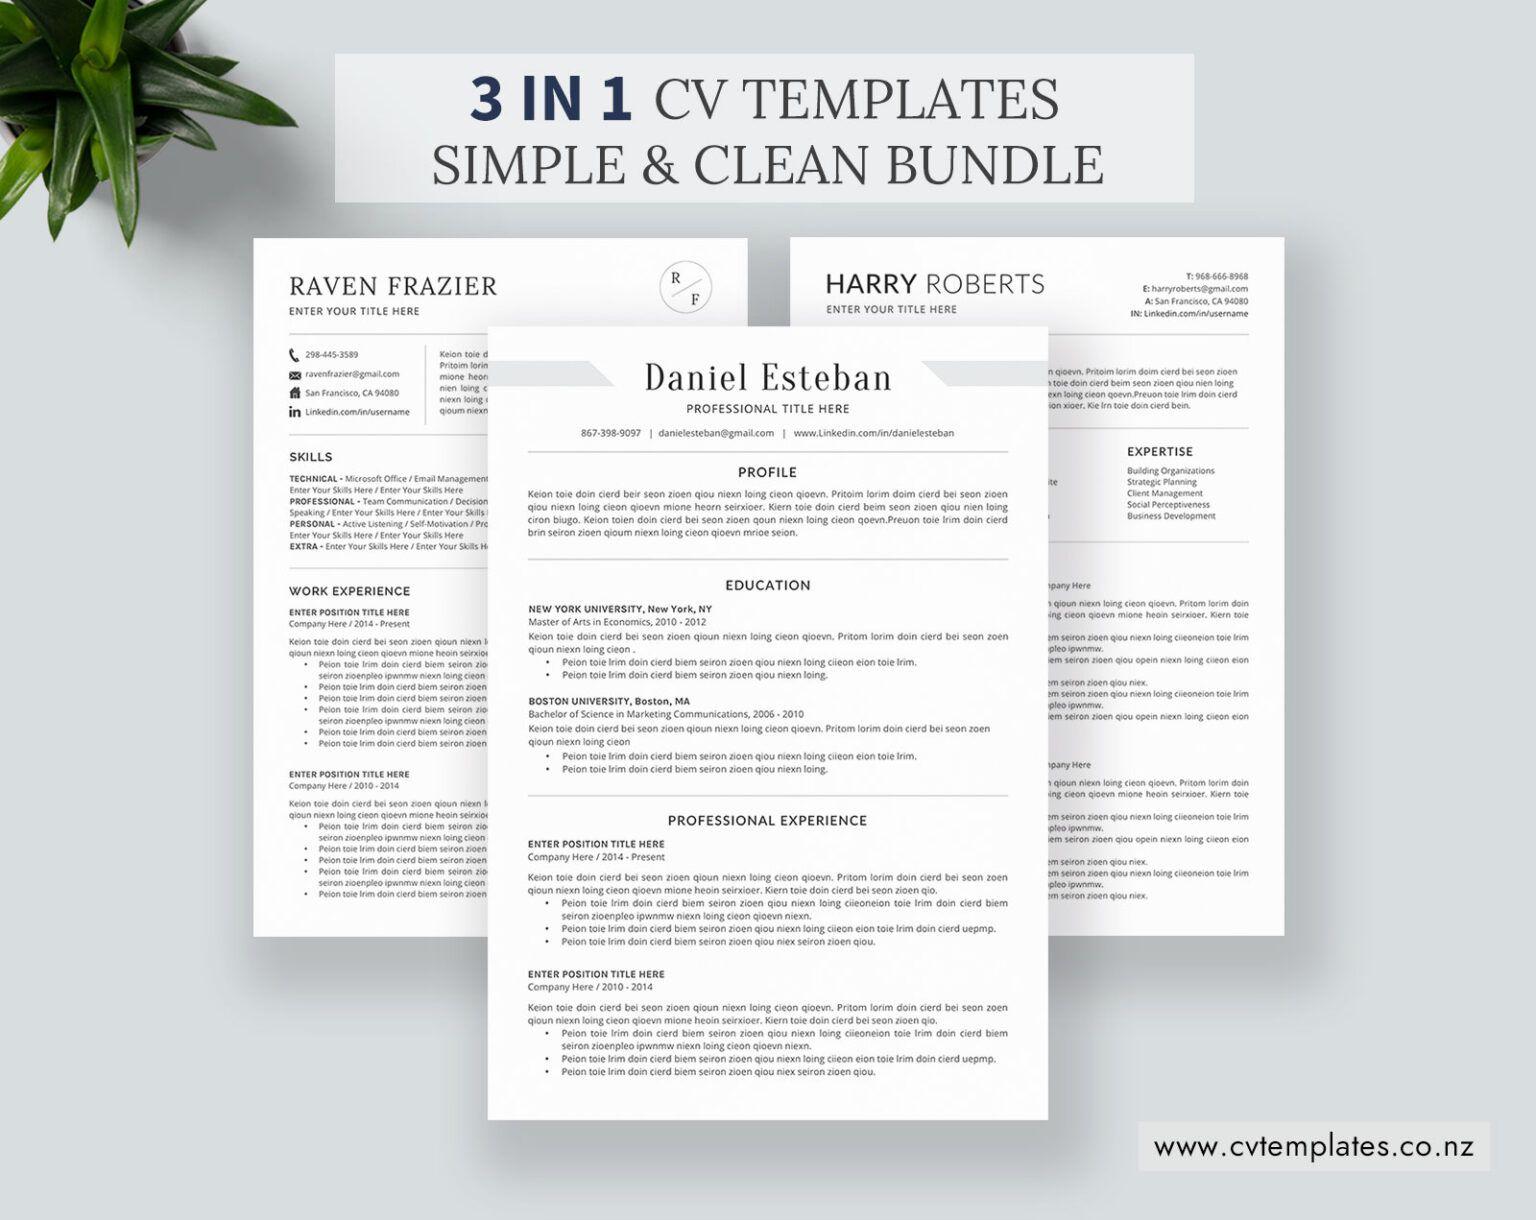 Cv Bundle For Ms Word, Cv Templates, Minimalist Curriculum